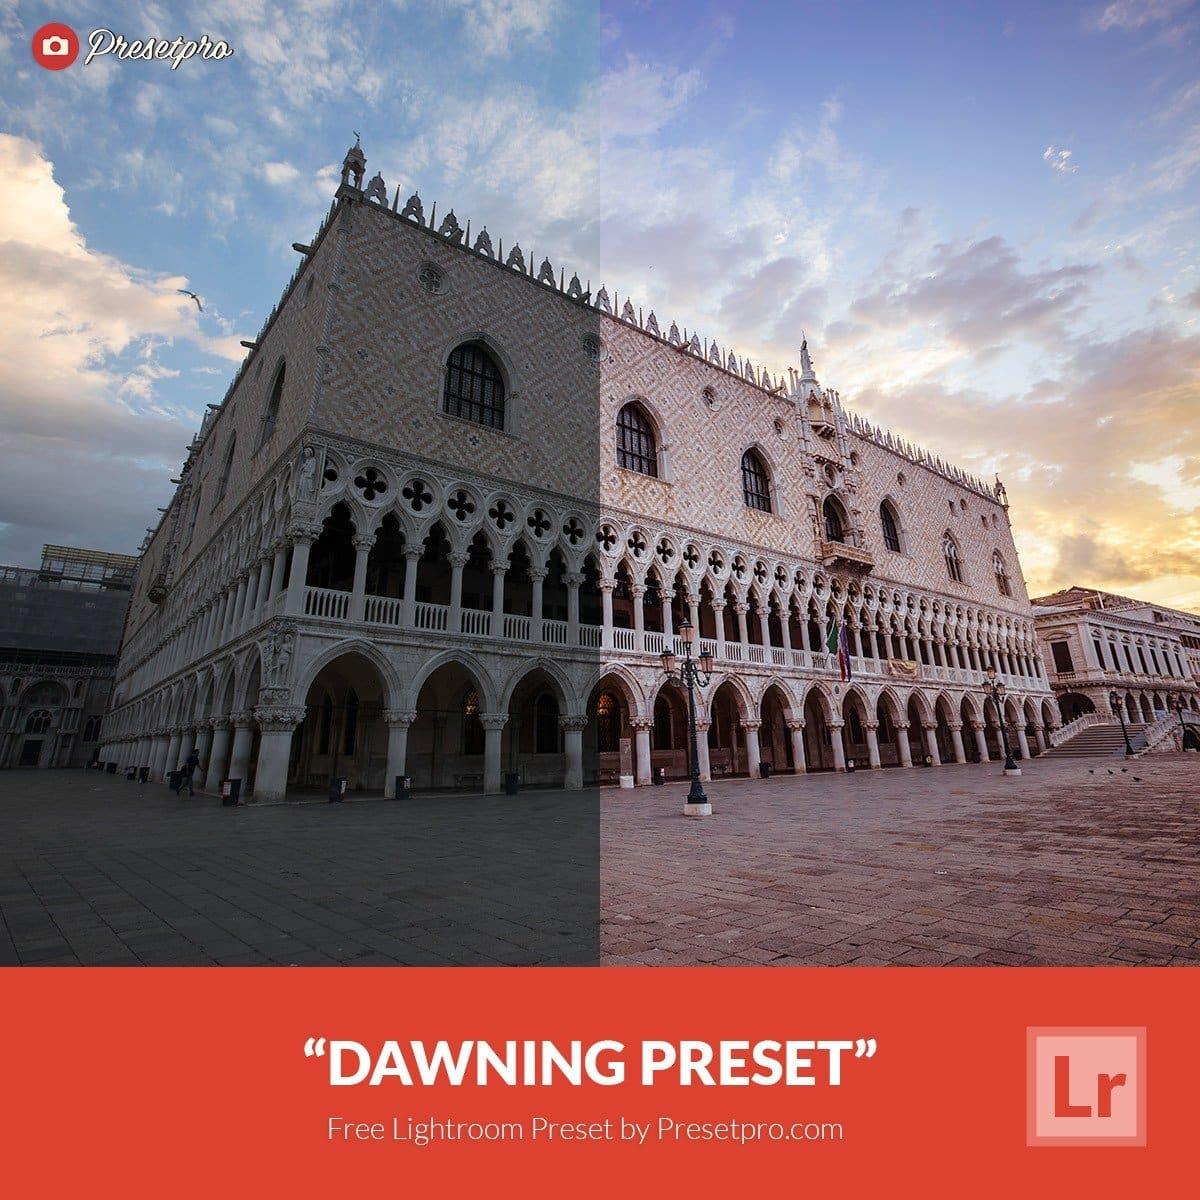 Free-Lightroom-Preset-Dawning-Presetpro.com